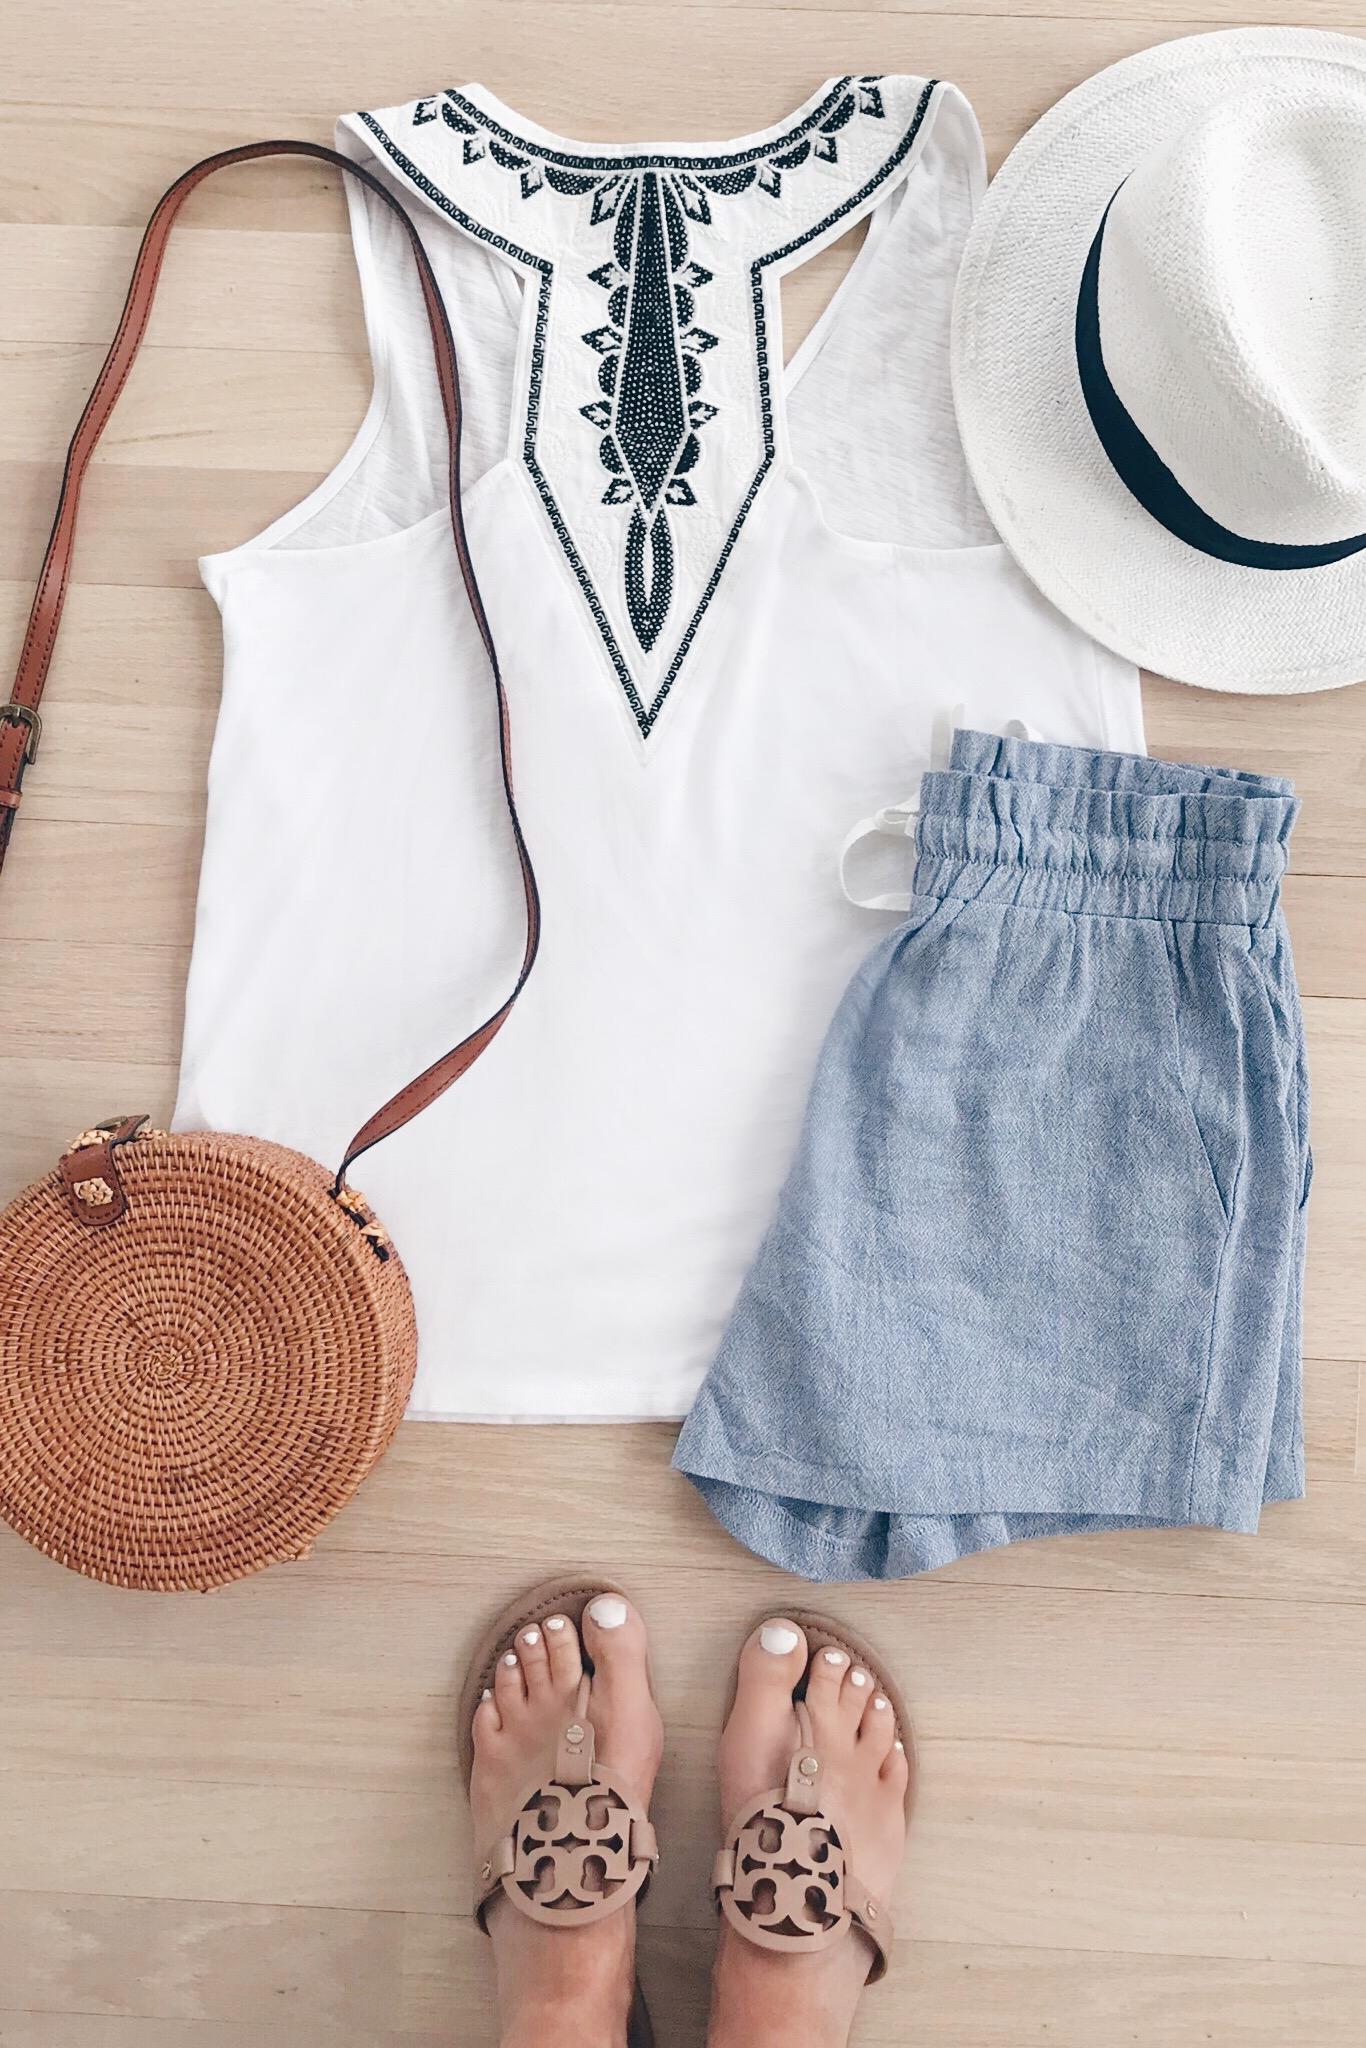 resort wear 2019 - gibson x cassiesugarplum back detail tank and shorts